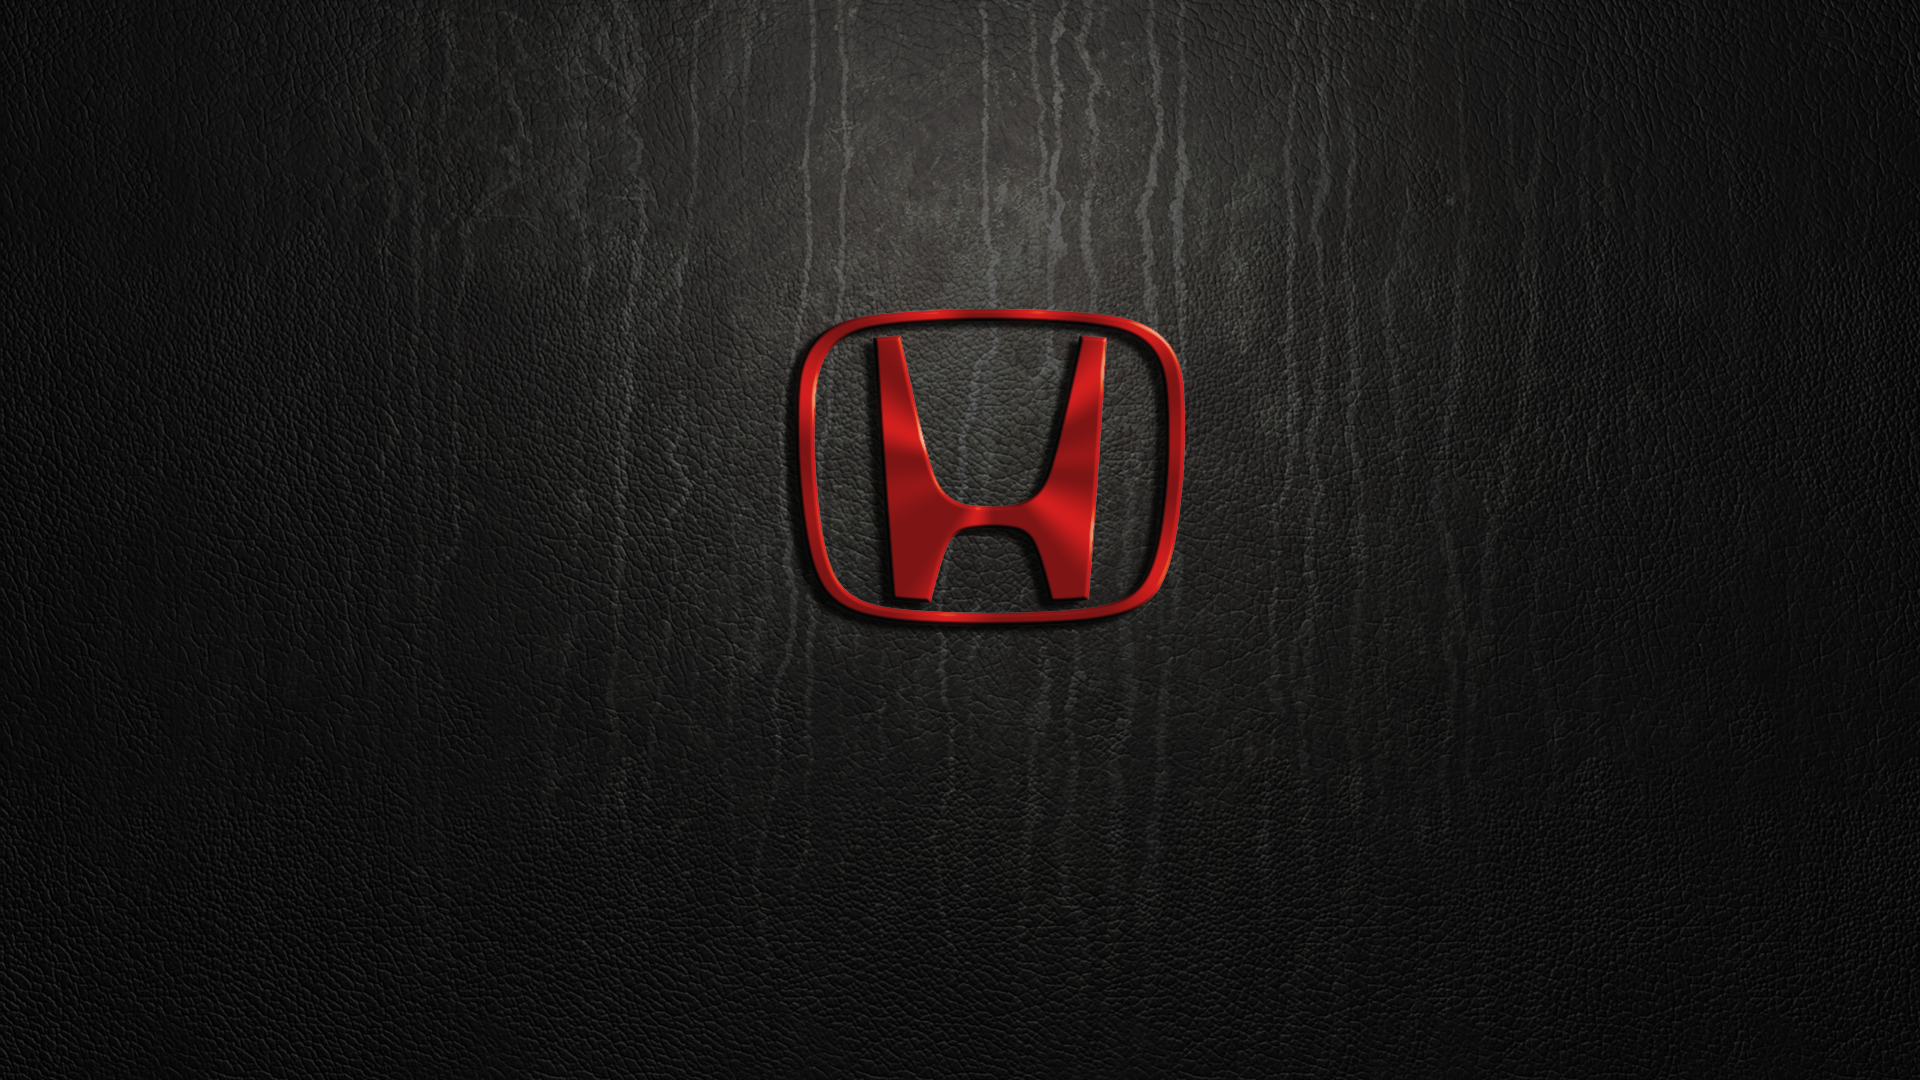 Honda Logo Photos Download Desktop Wallpaper Images Pictures 1920x1080